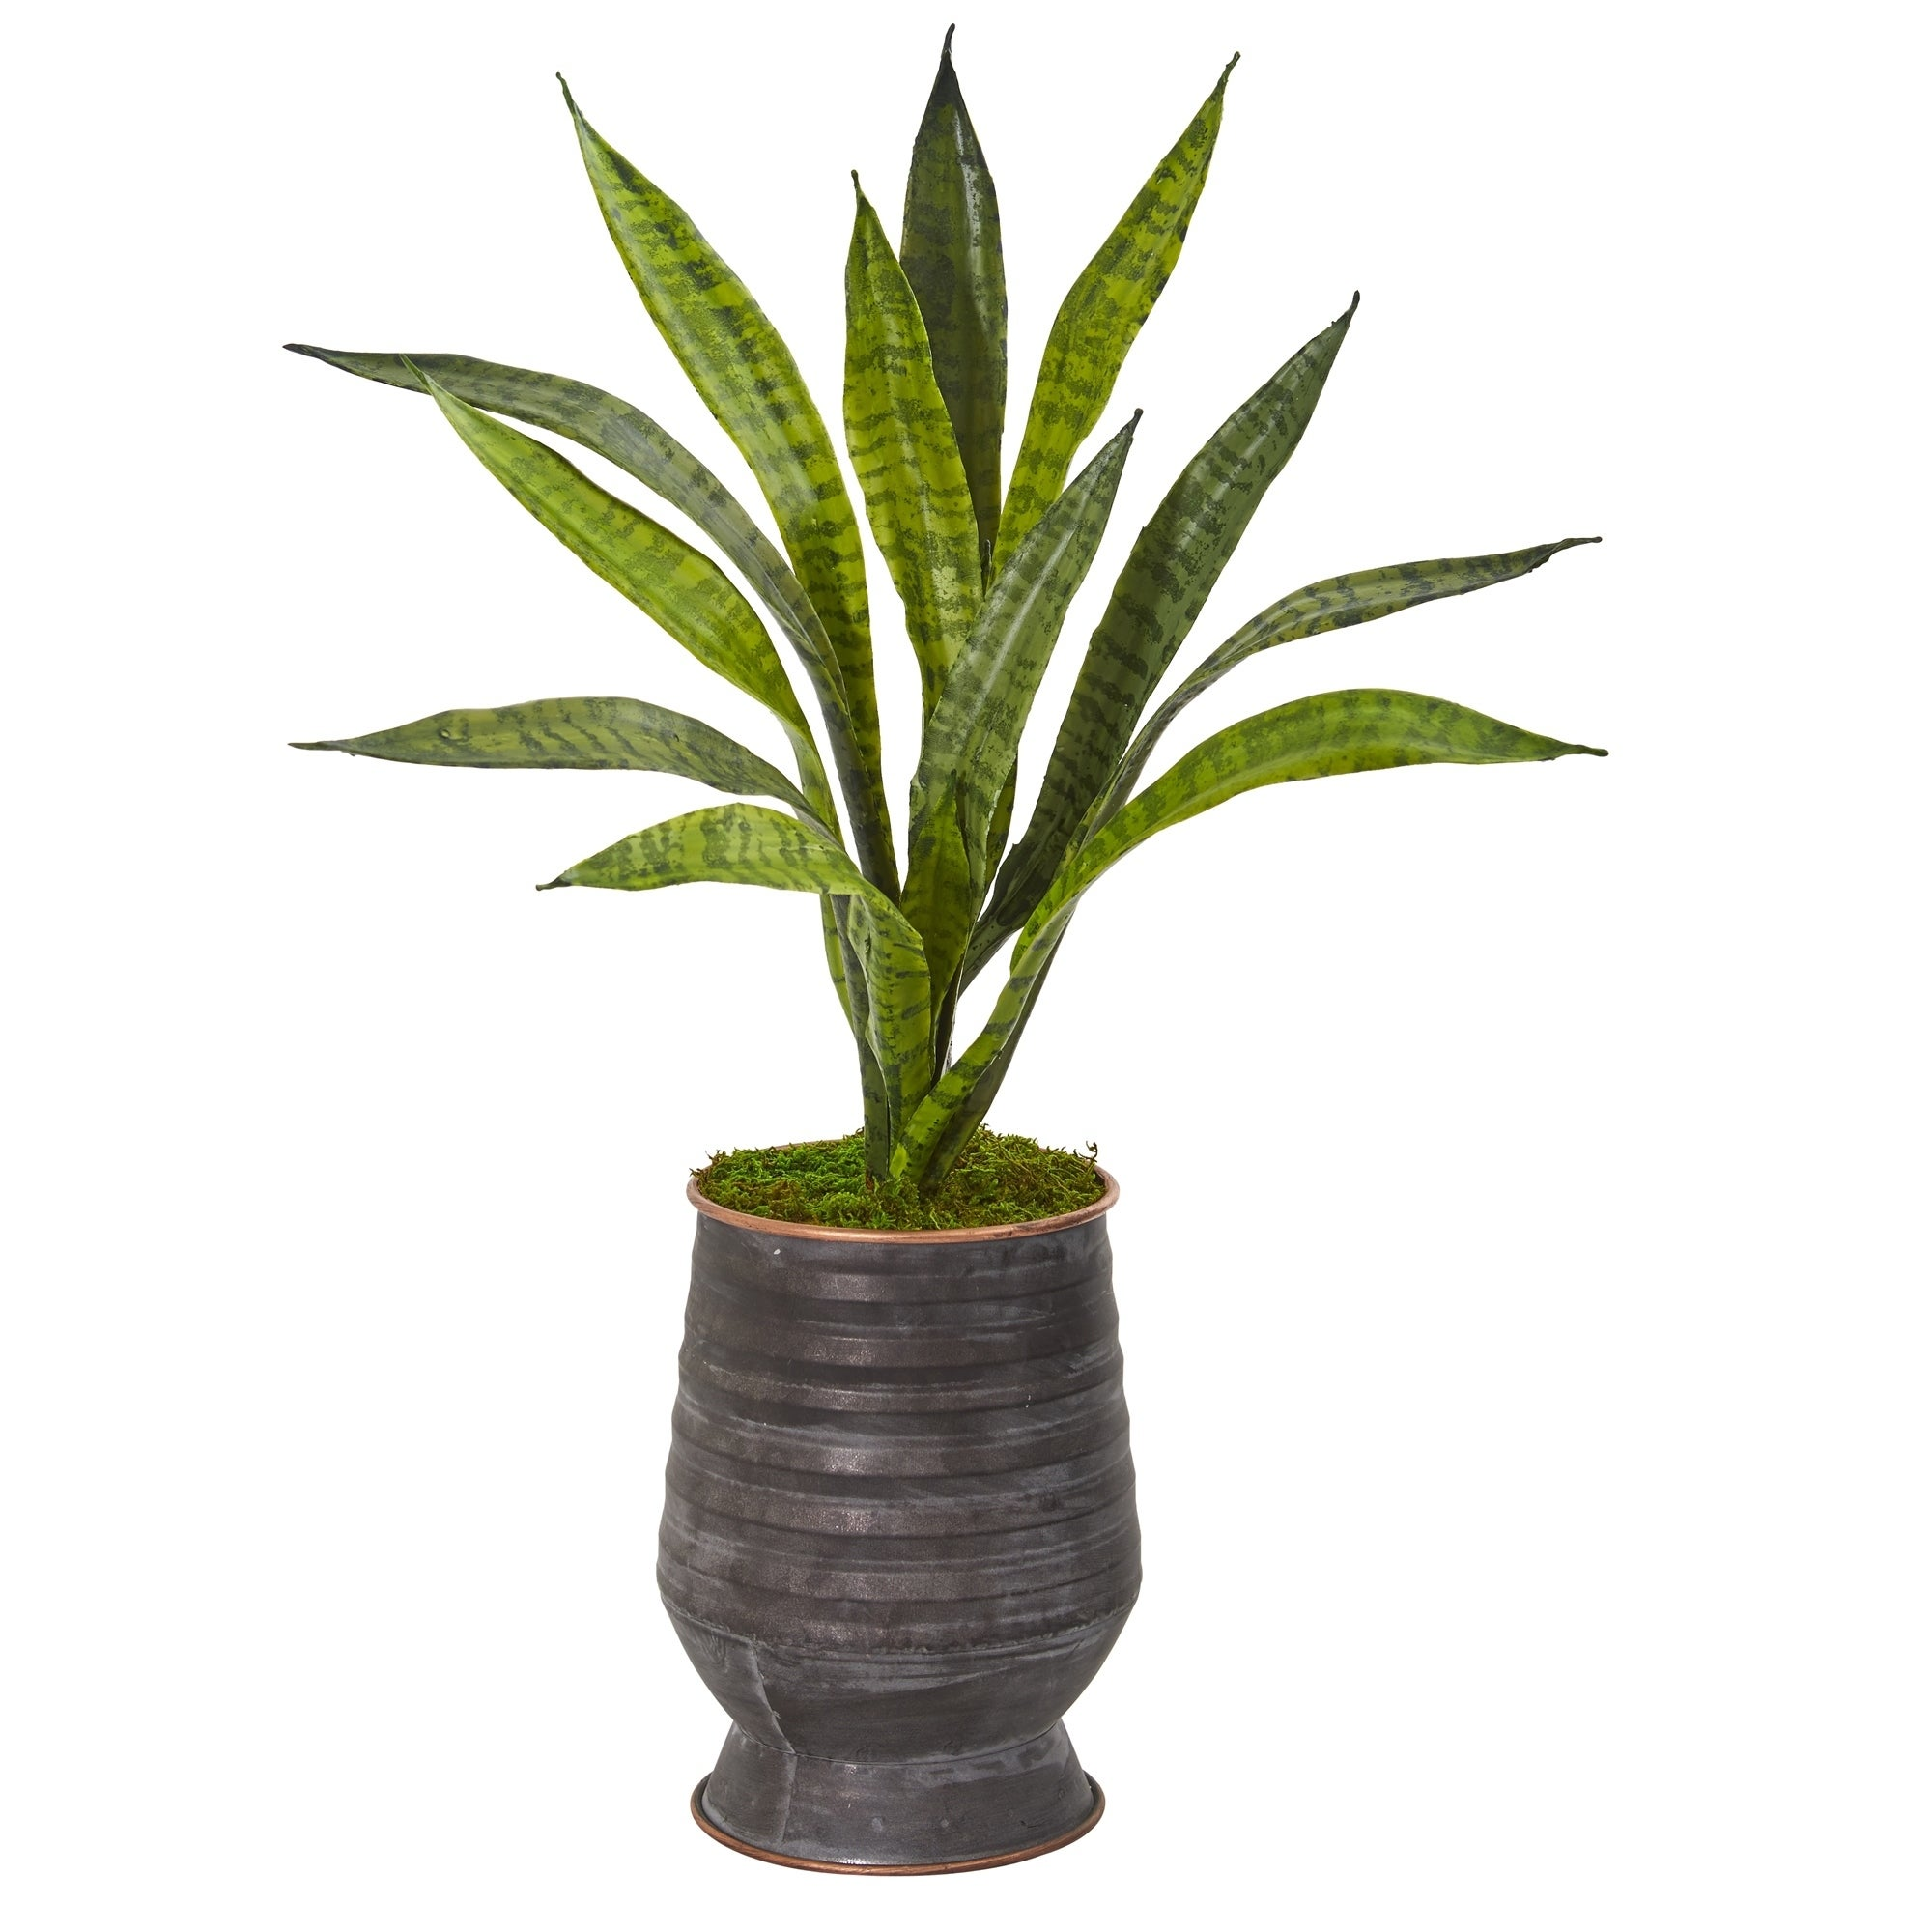 24 Sansevieria Artificial Plant in Decorative Planter